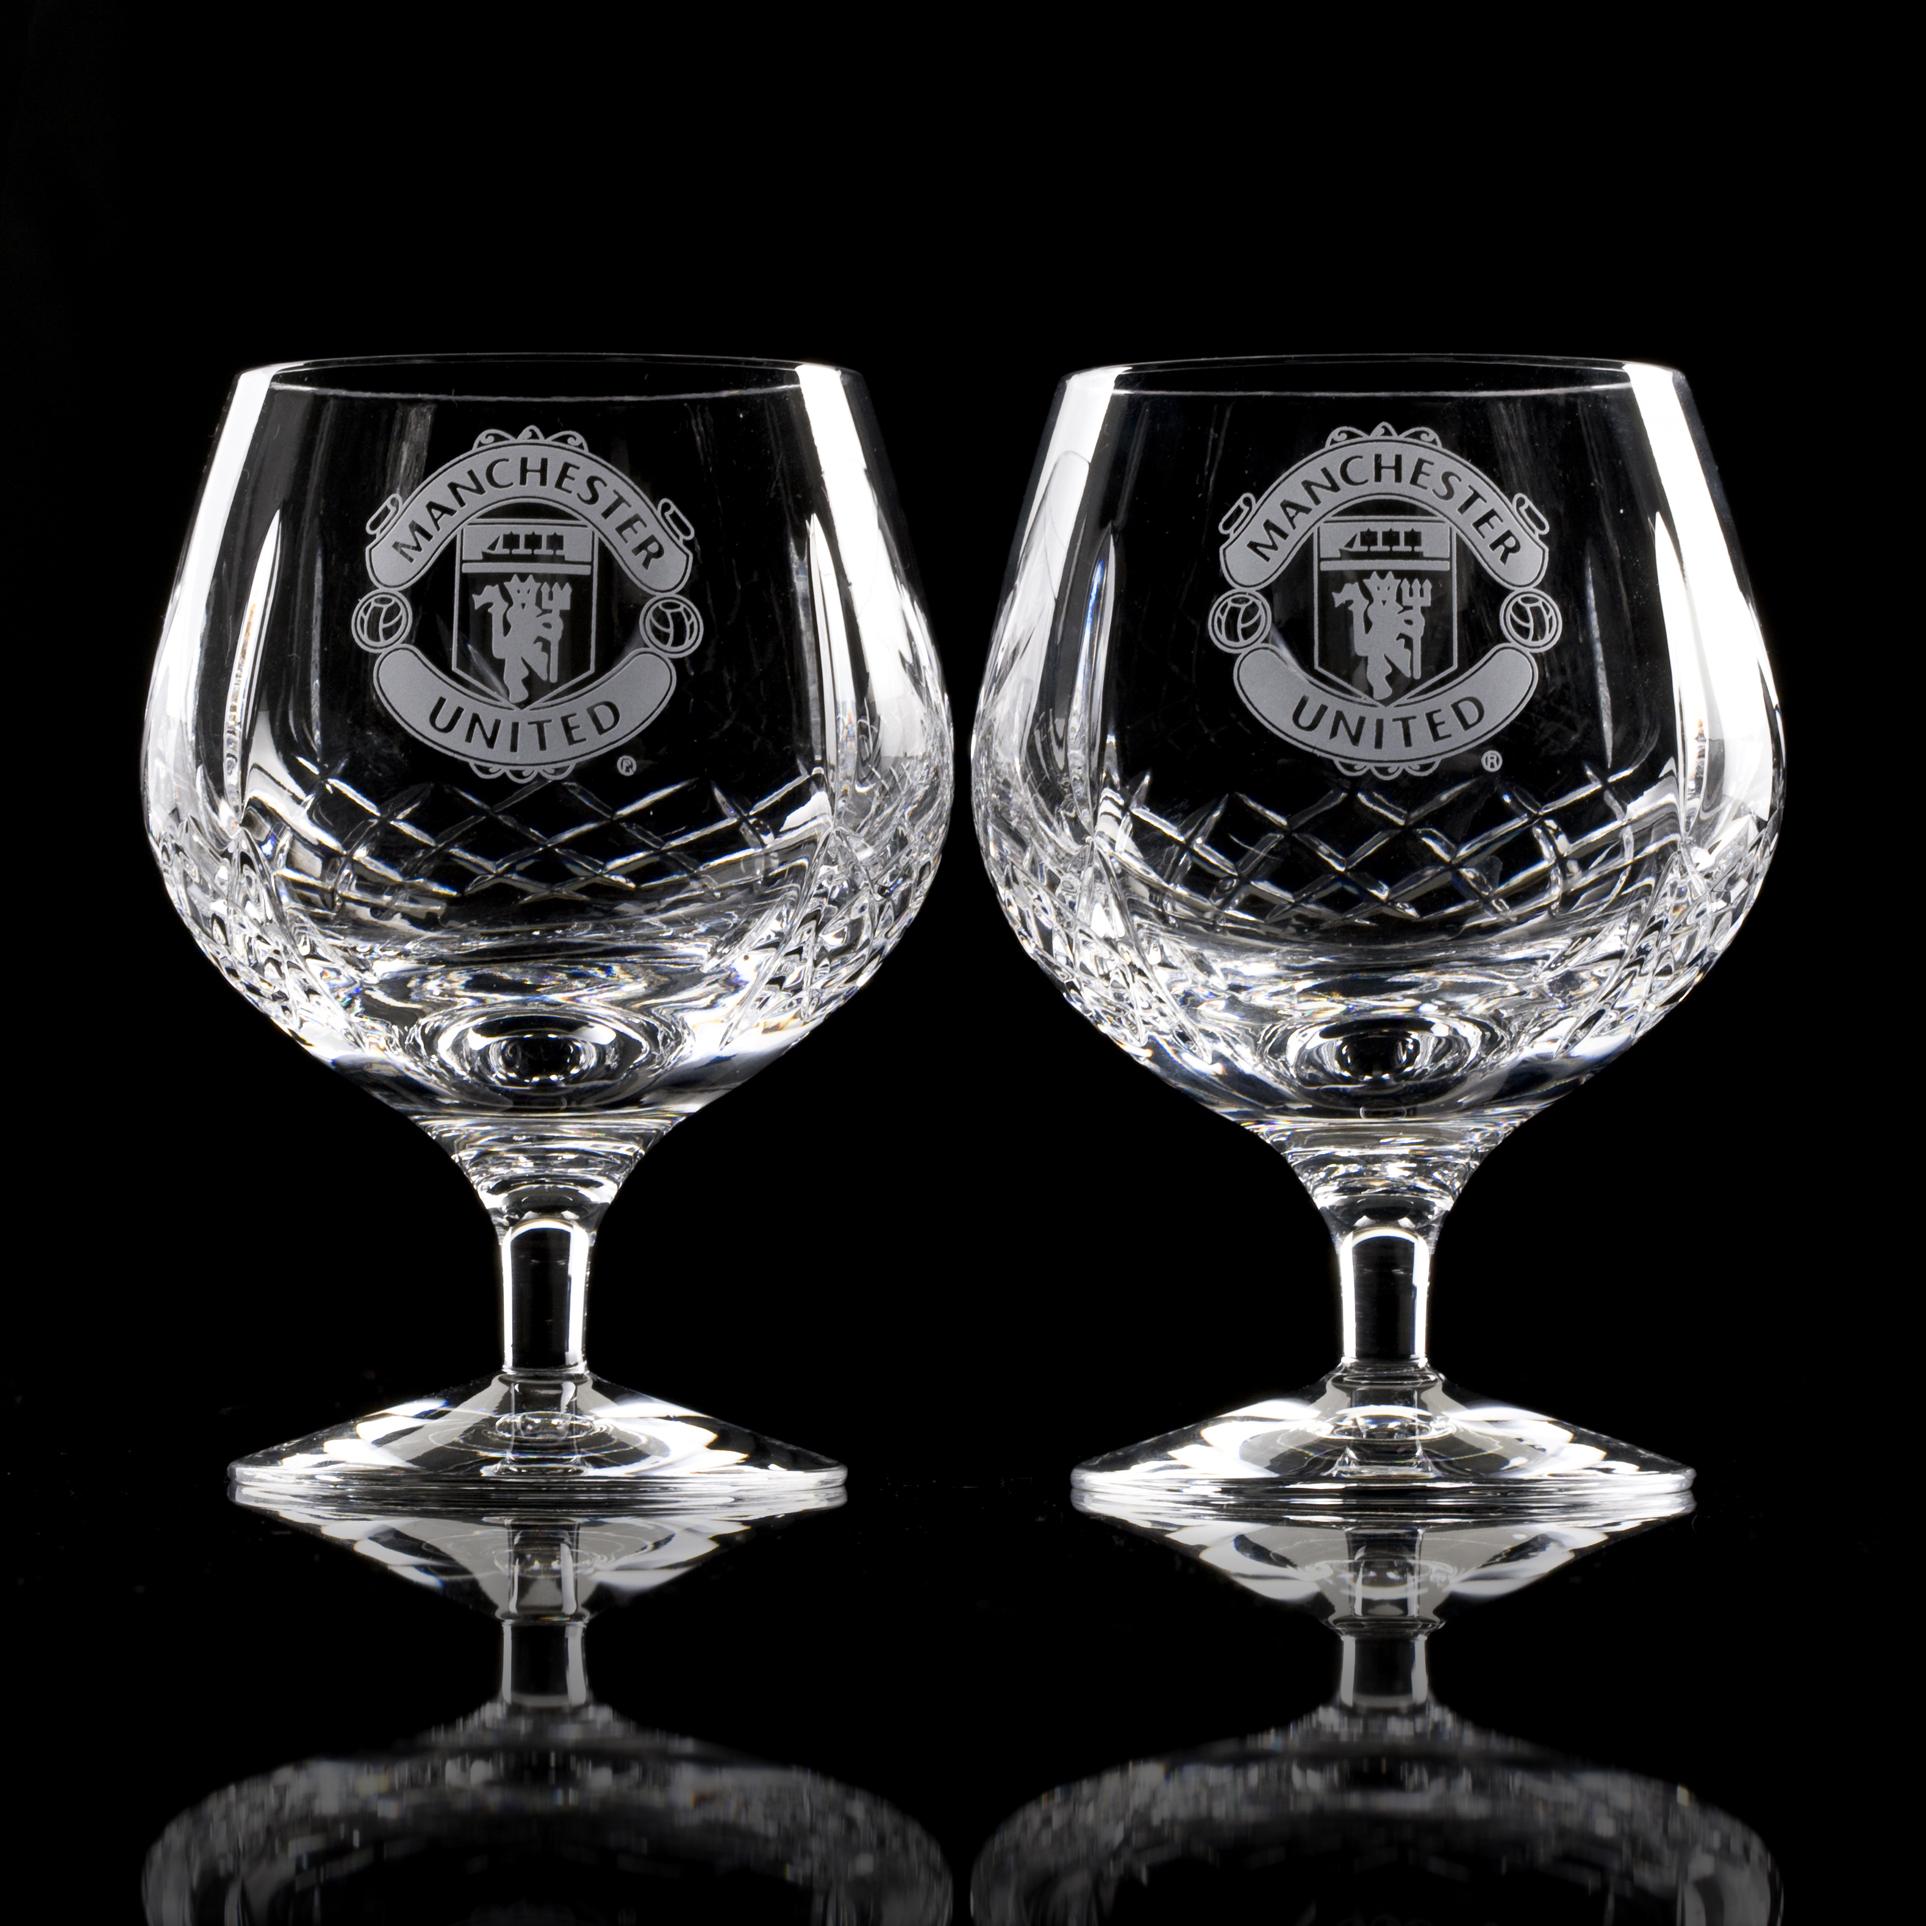 Manchester United Mayfair Crystallite Brandy Glass - Pair